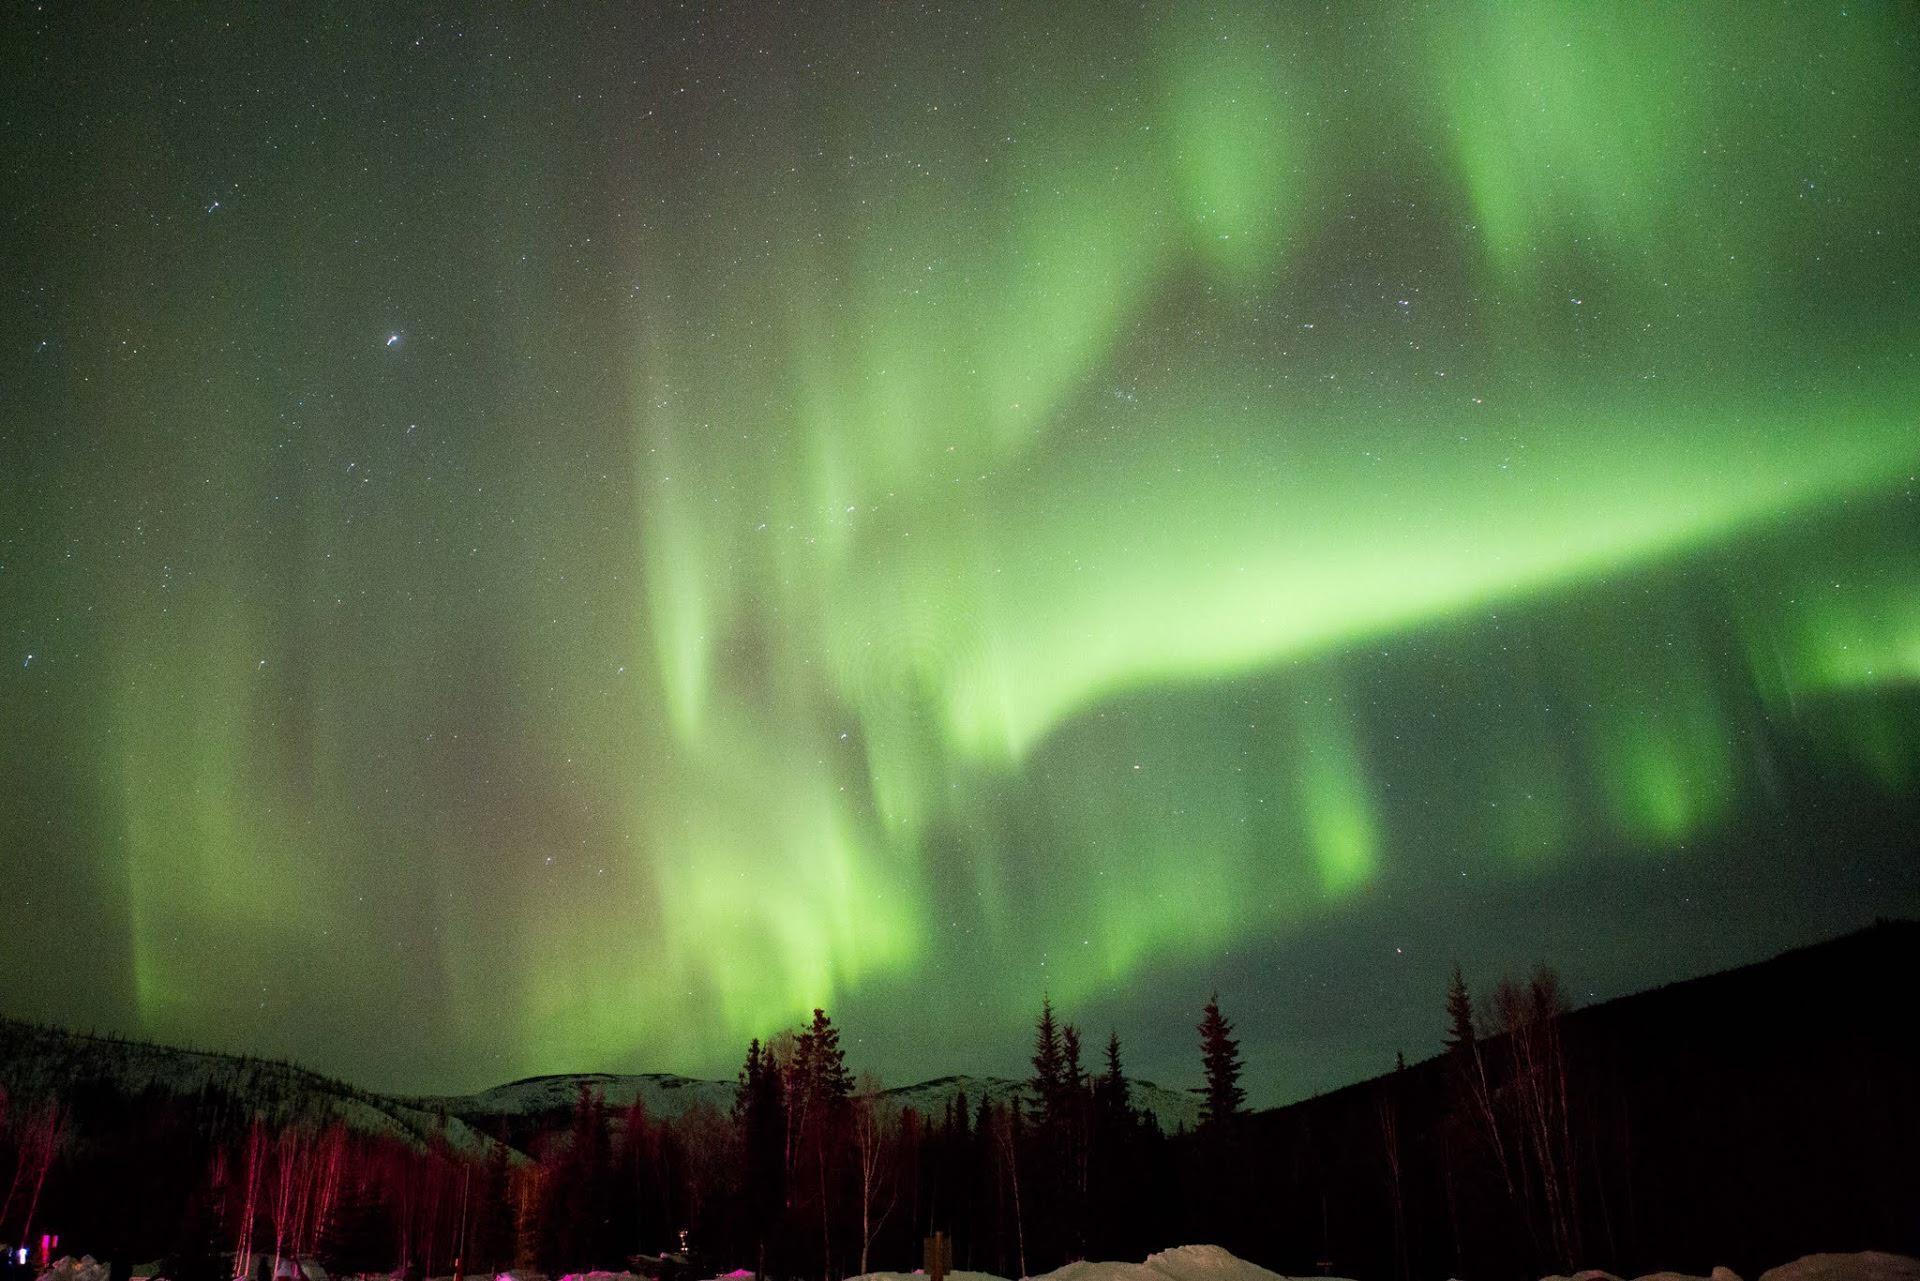 Alaska NL 3 image